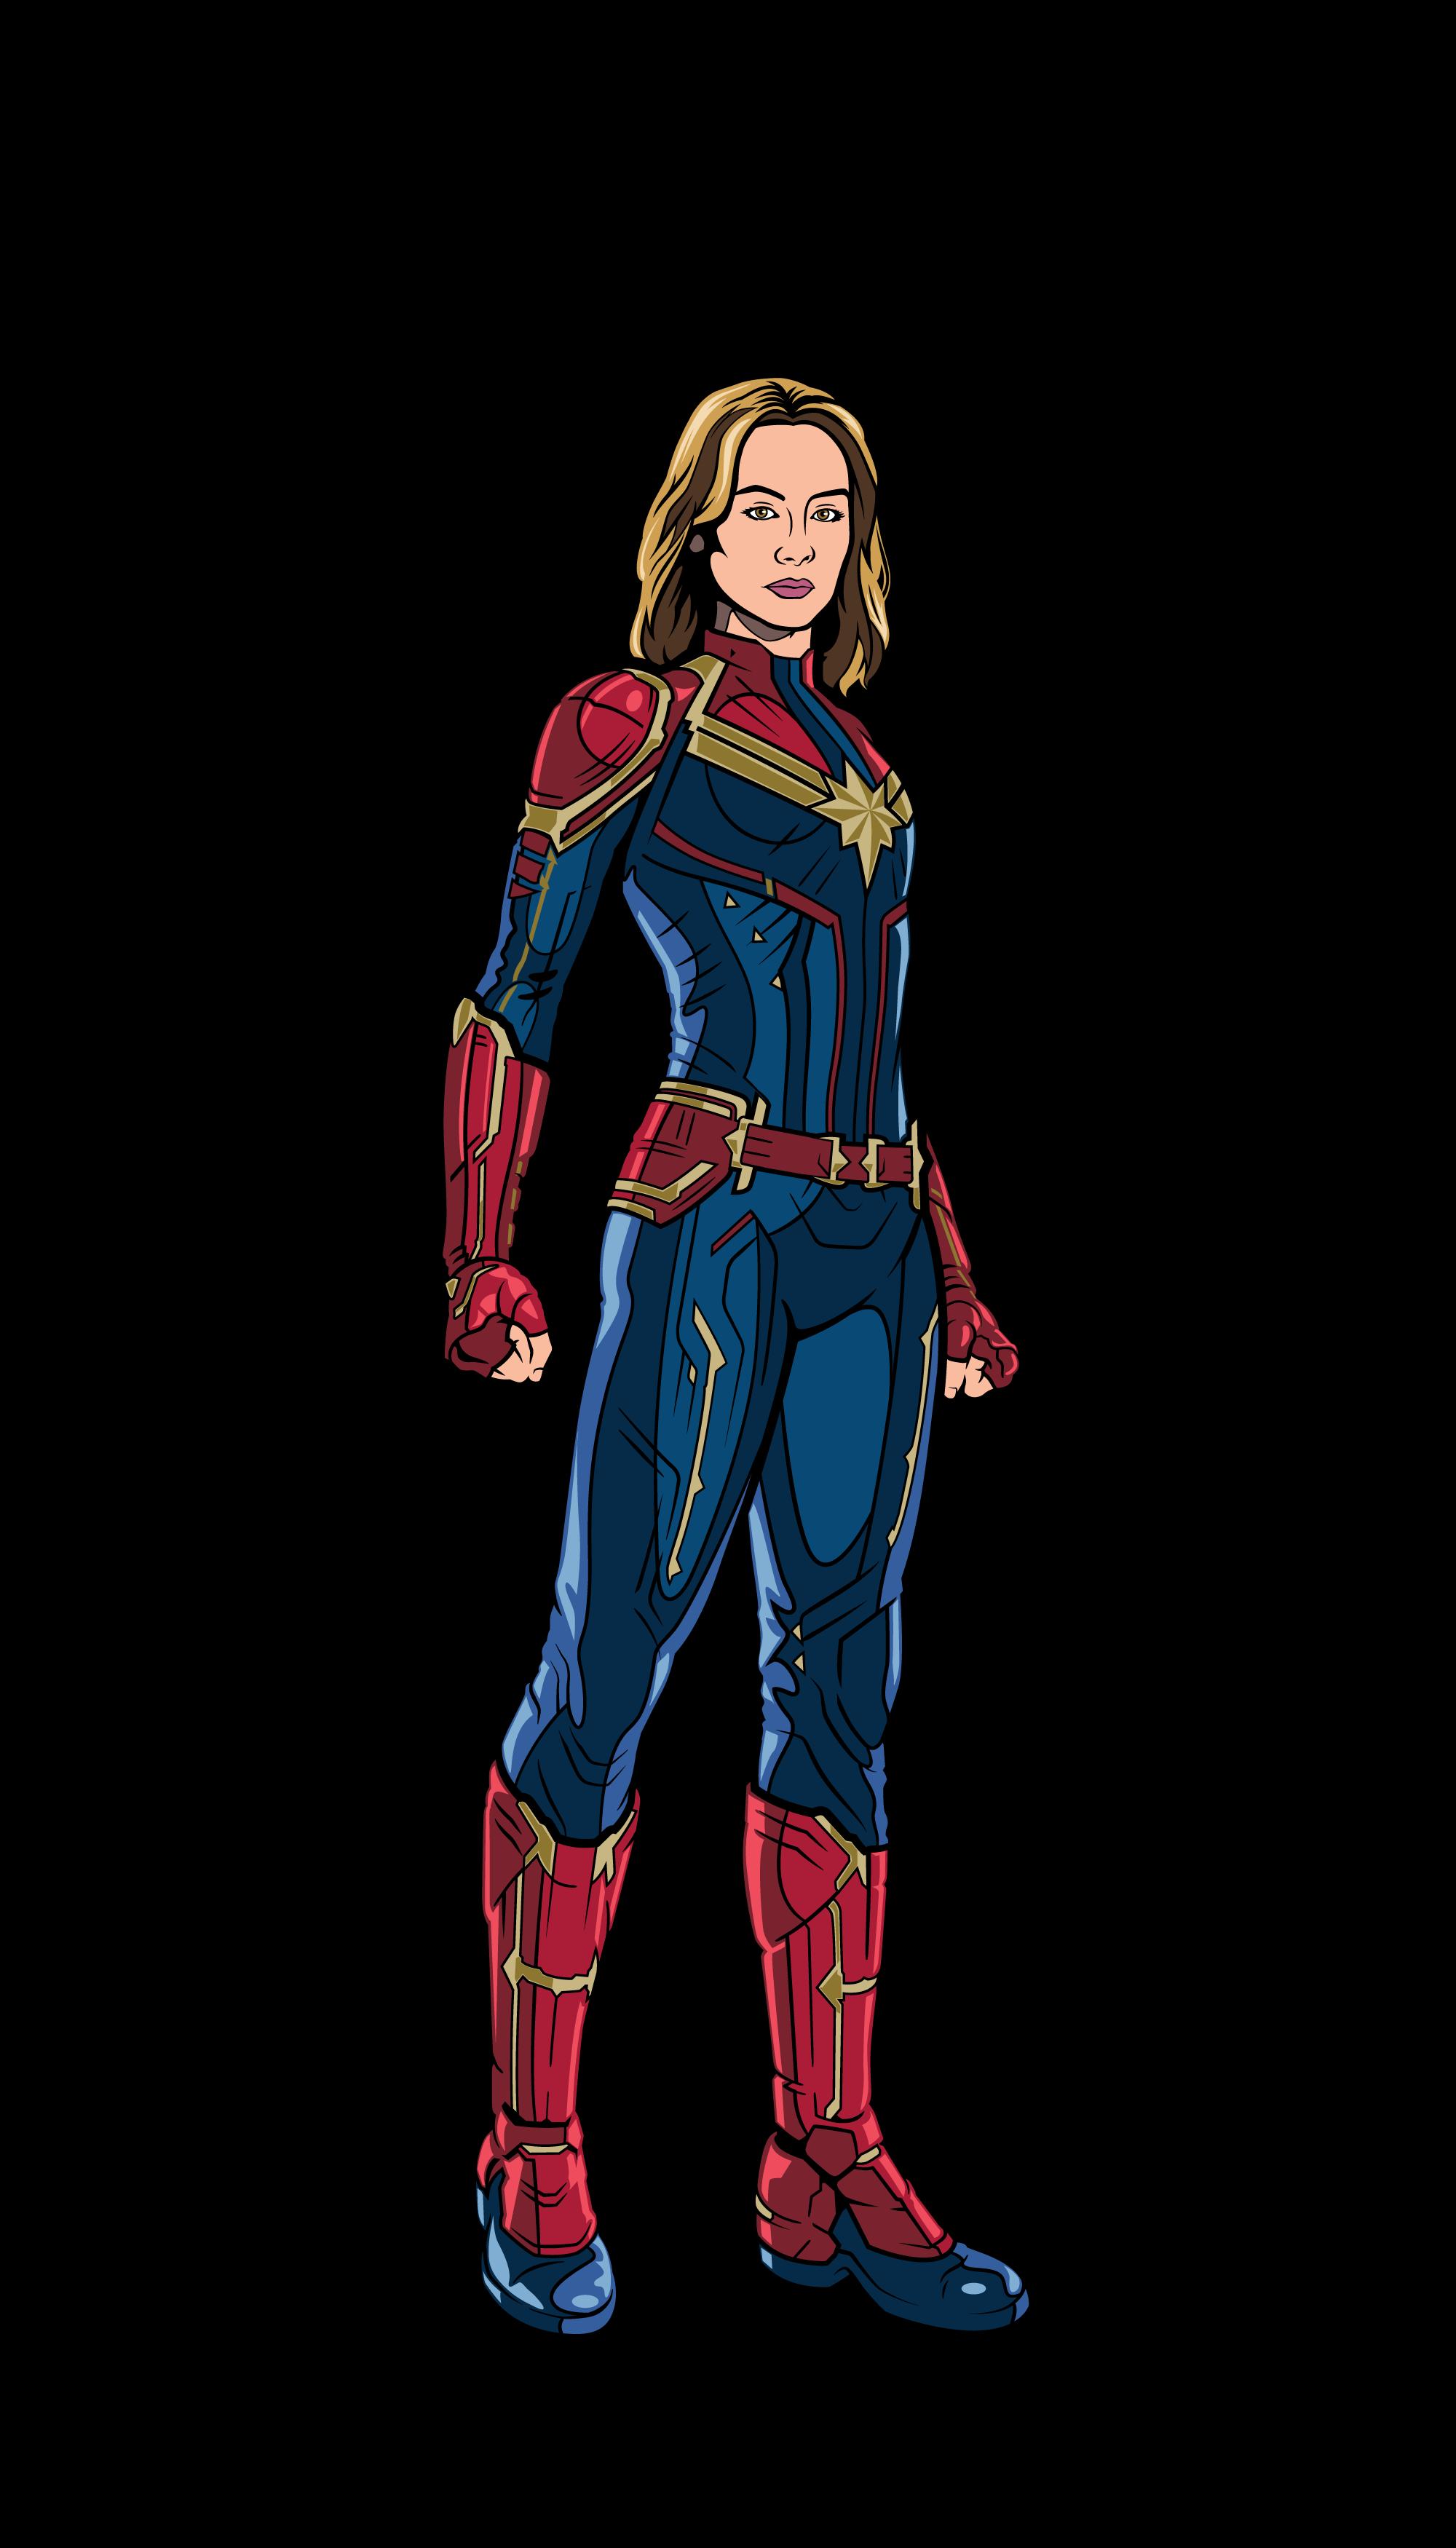 12 Captain Marvel Png Transparent Gif Https Goo Gl 9jyxyp In 2021 Captain Marvel Marvel Captain